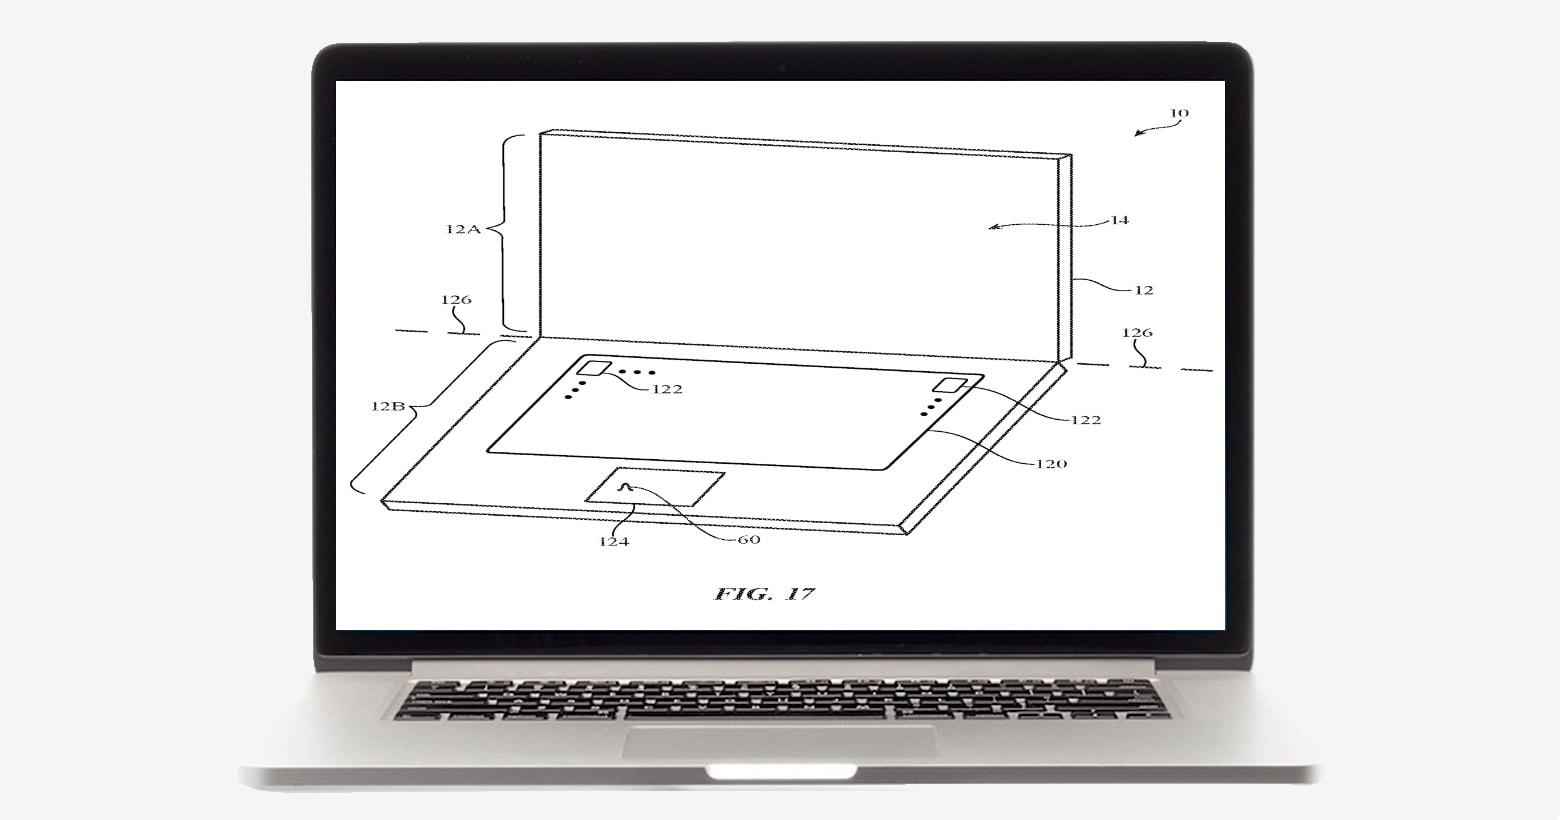 Dual-screen MacBook patent